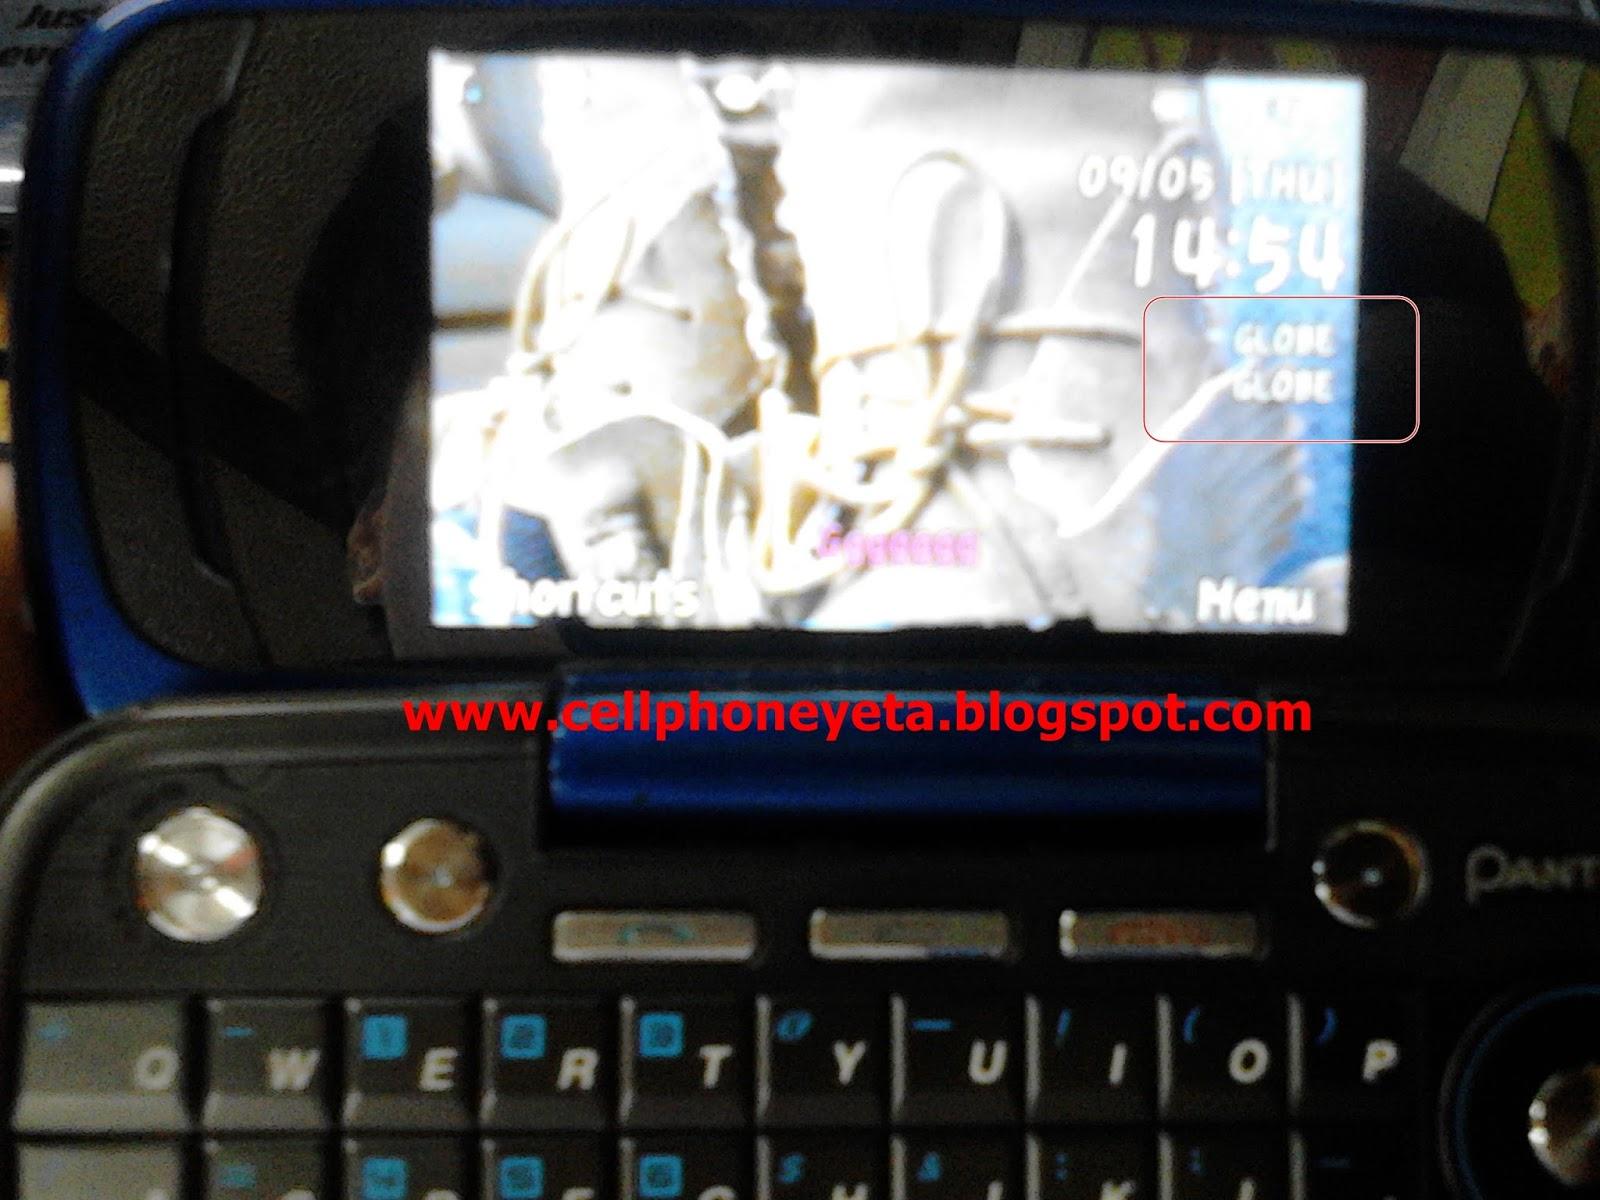 Cellphoneyeta: Unlock